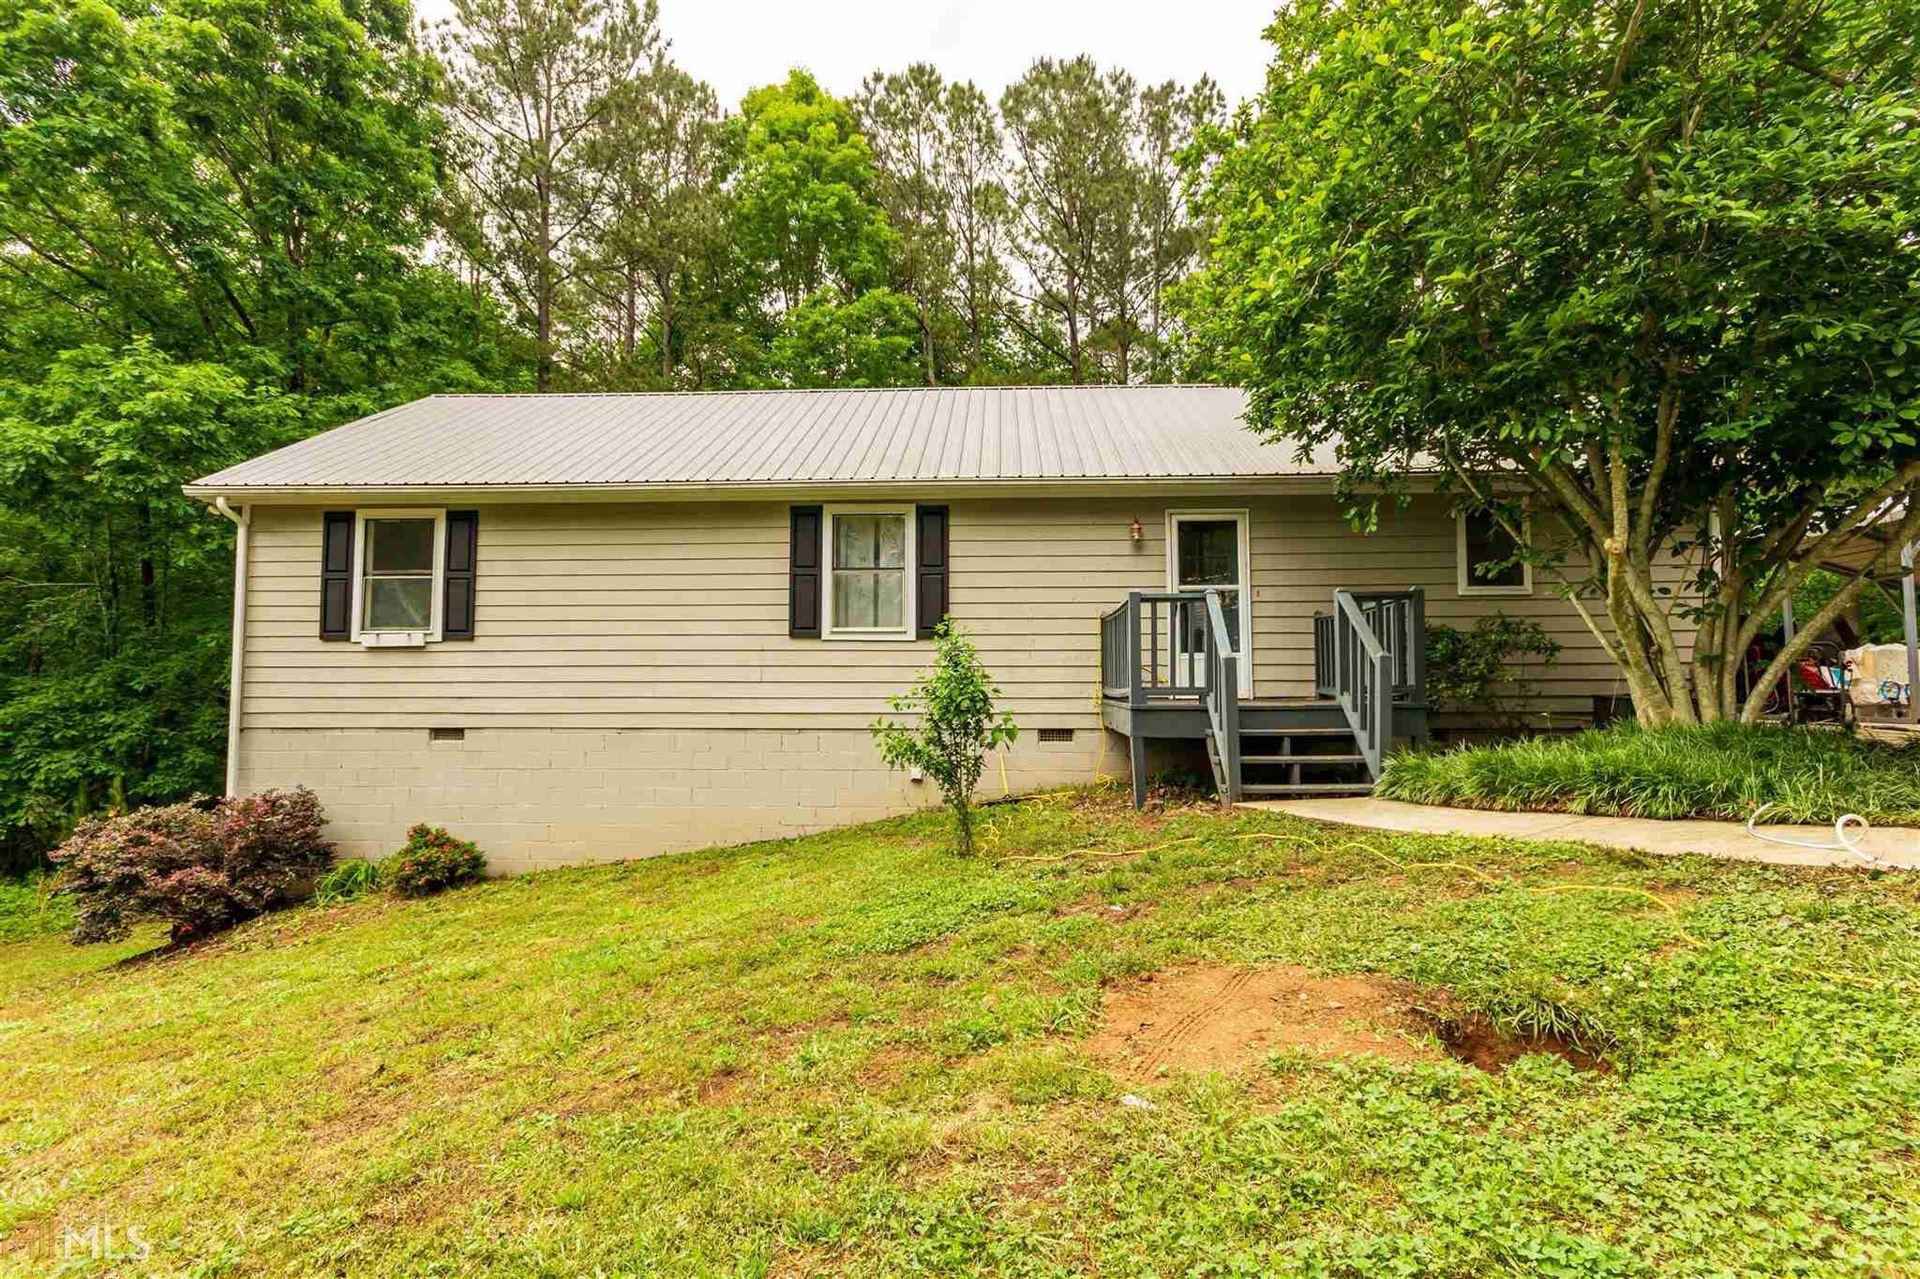 50 Bobolink Ct, Monticello, GA 31064 - MLS#: 8973225